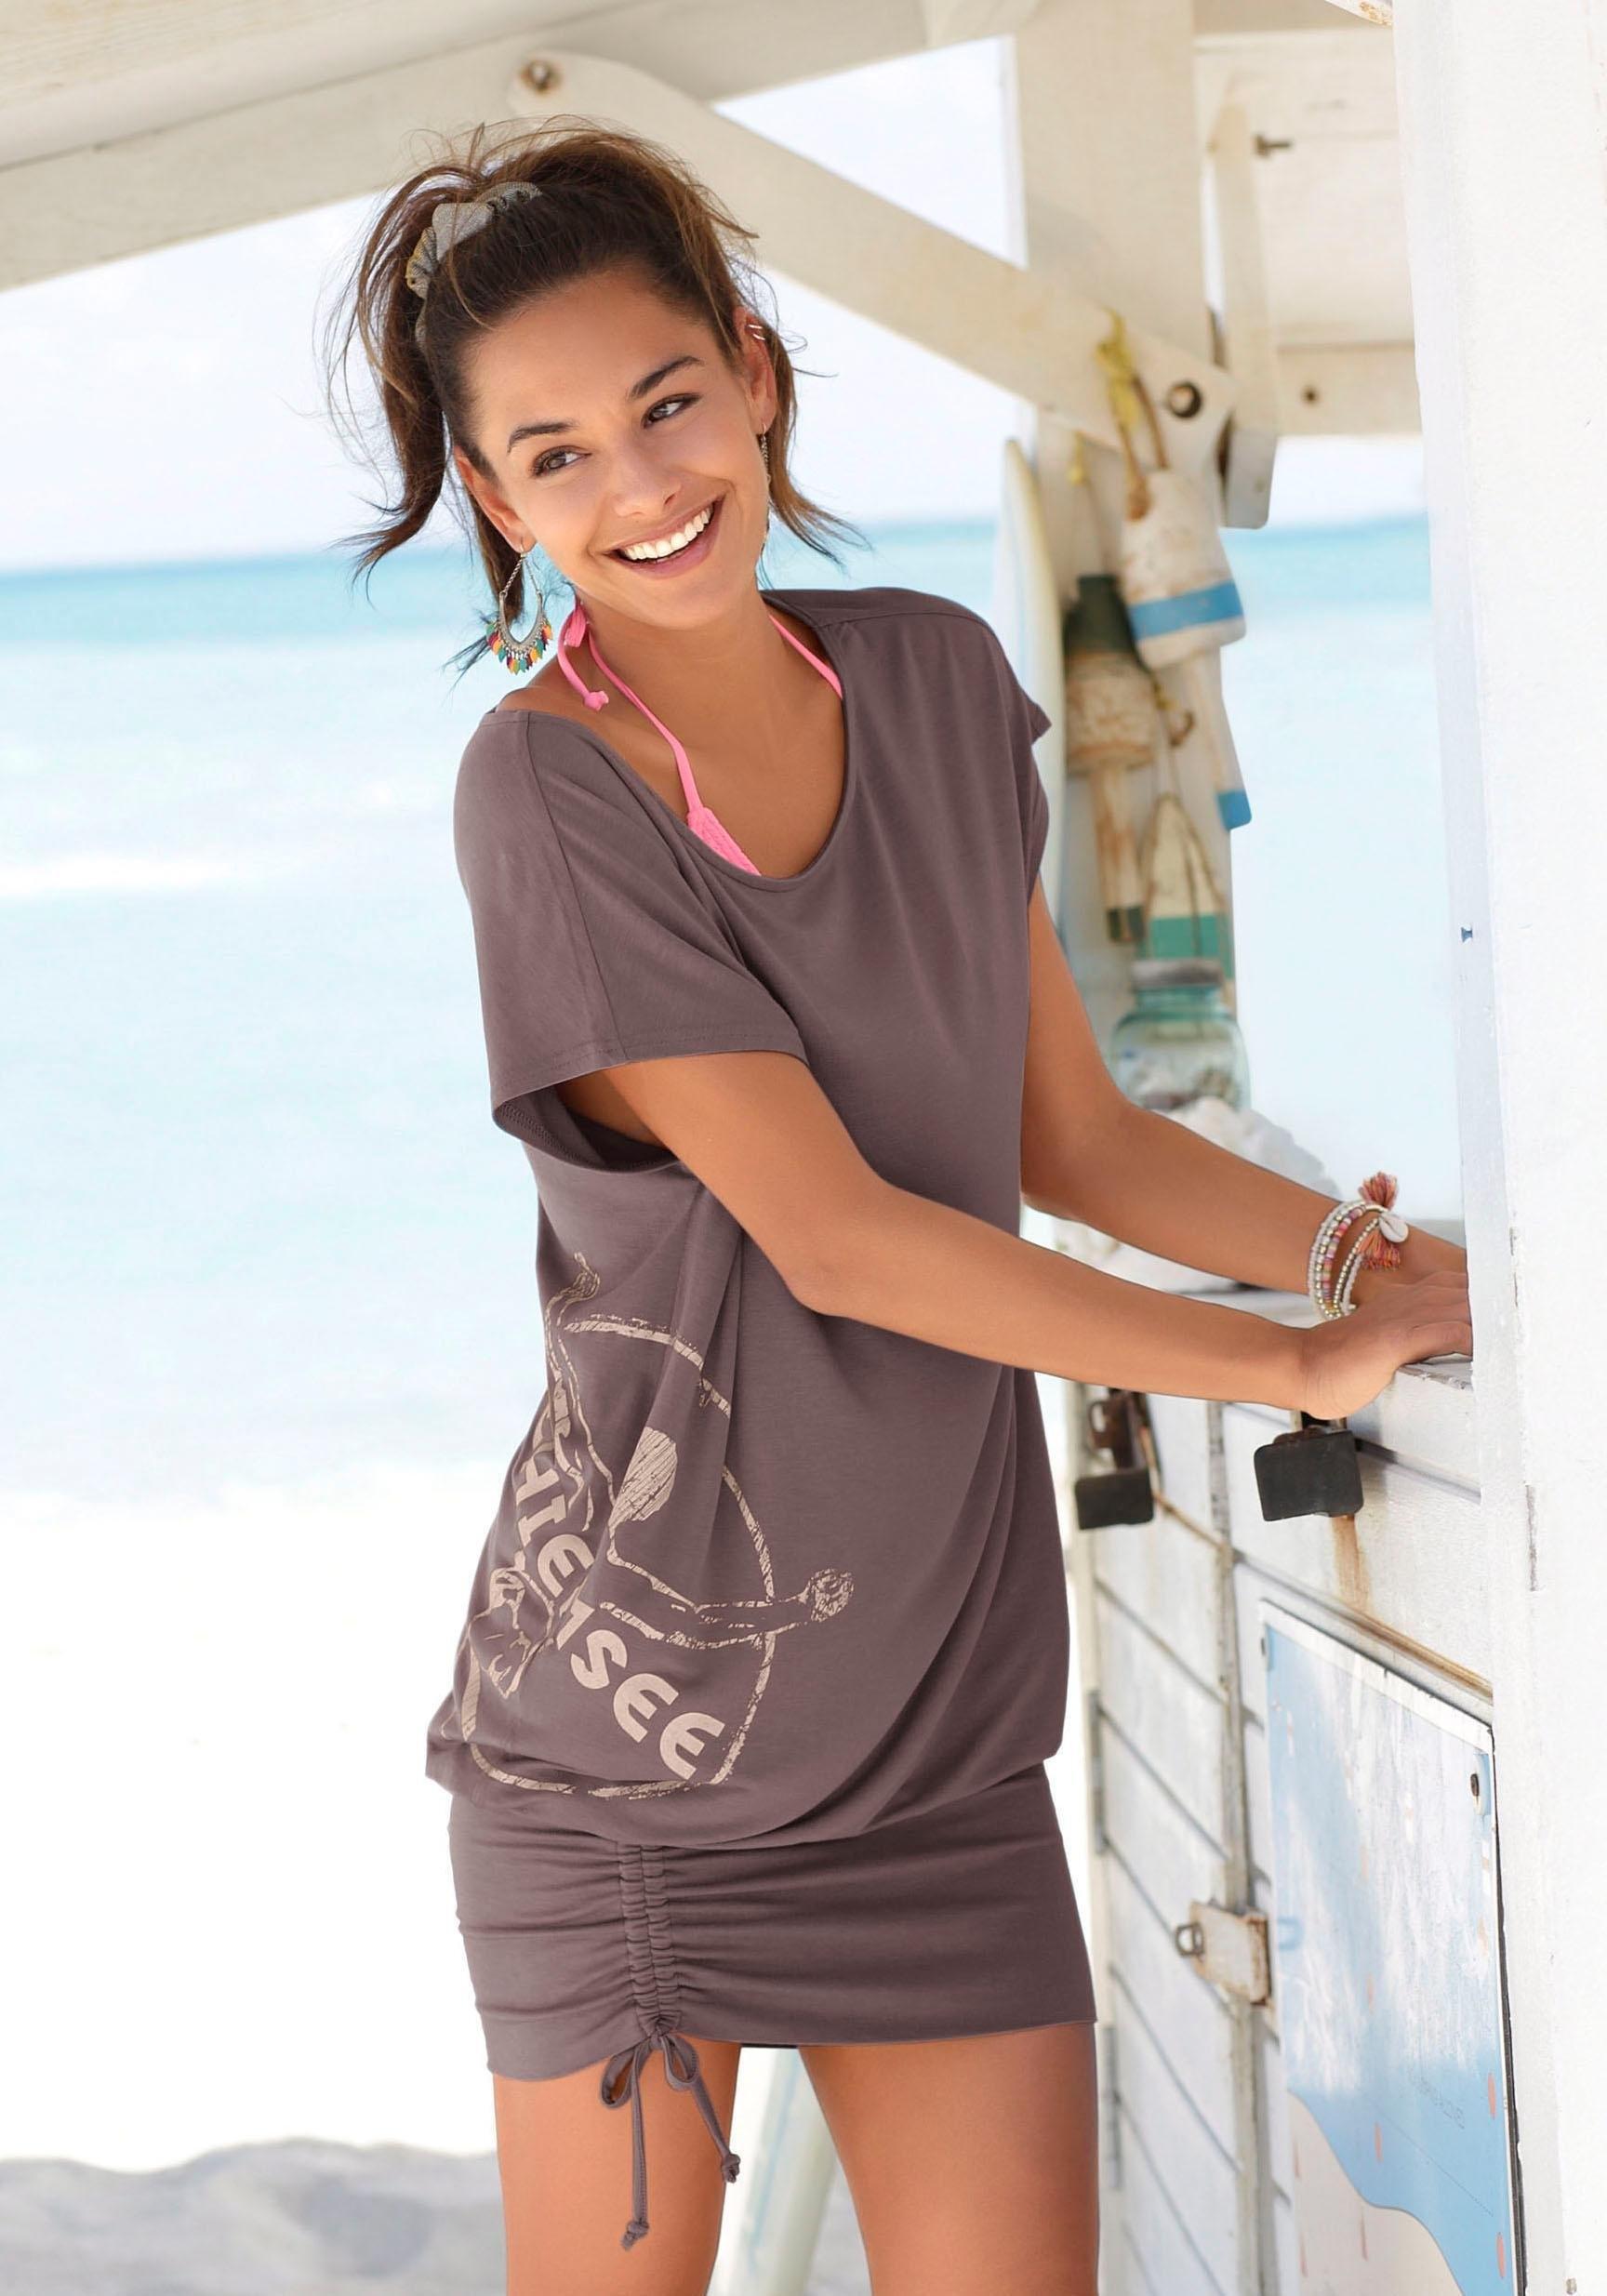 Chiemsee lang shirt met smalle rok goedkoop op lascana.nl kopen